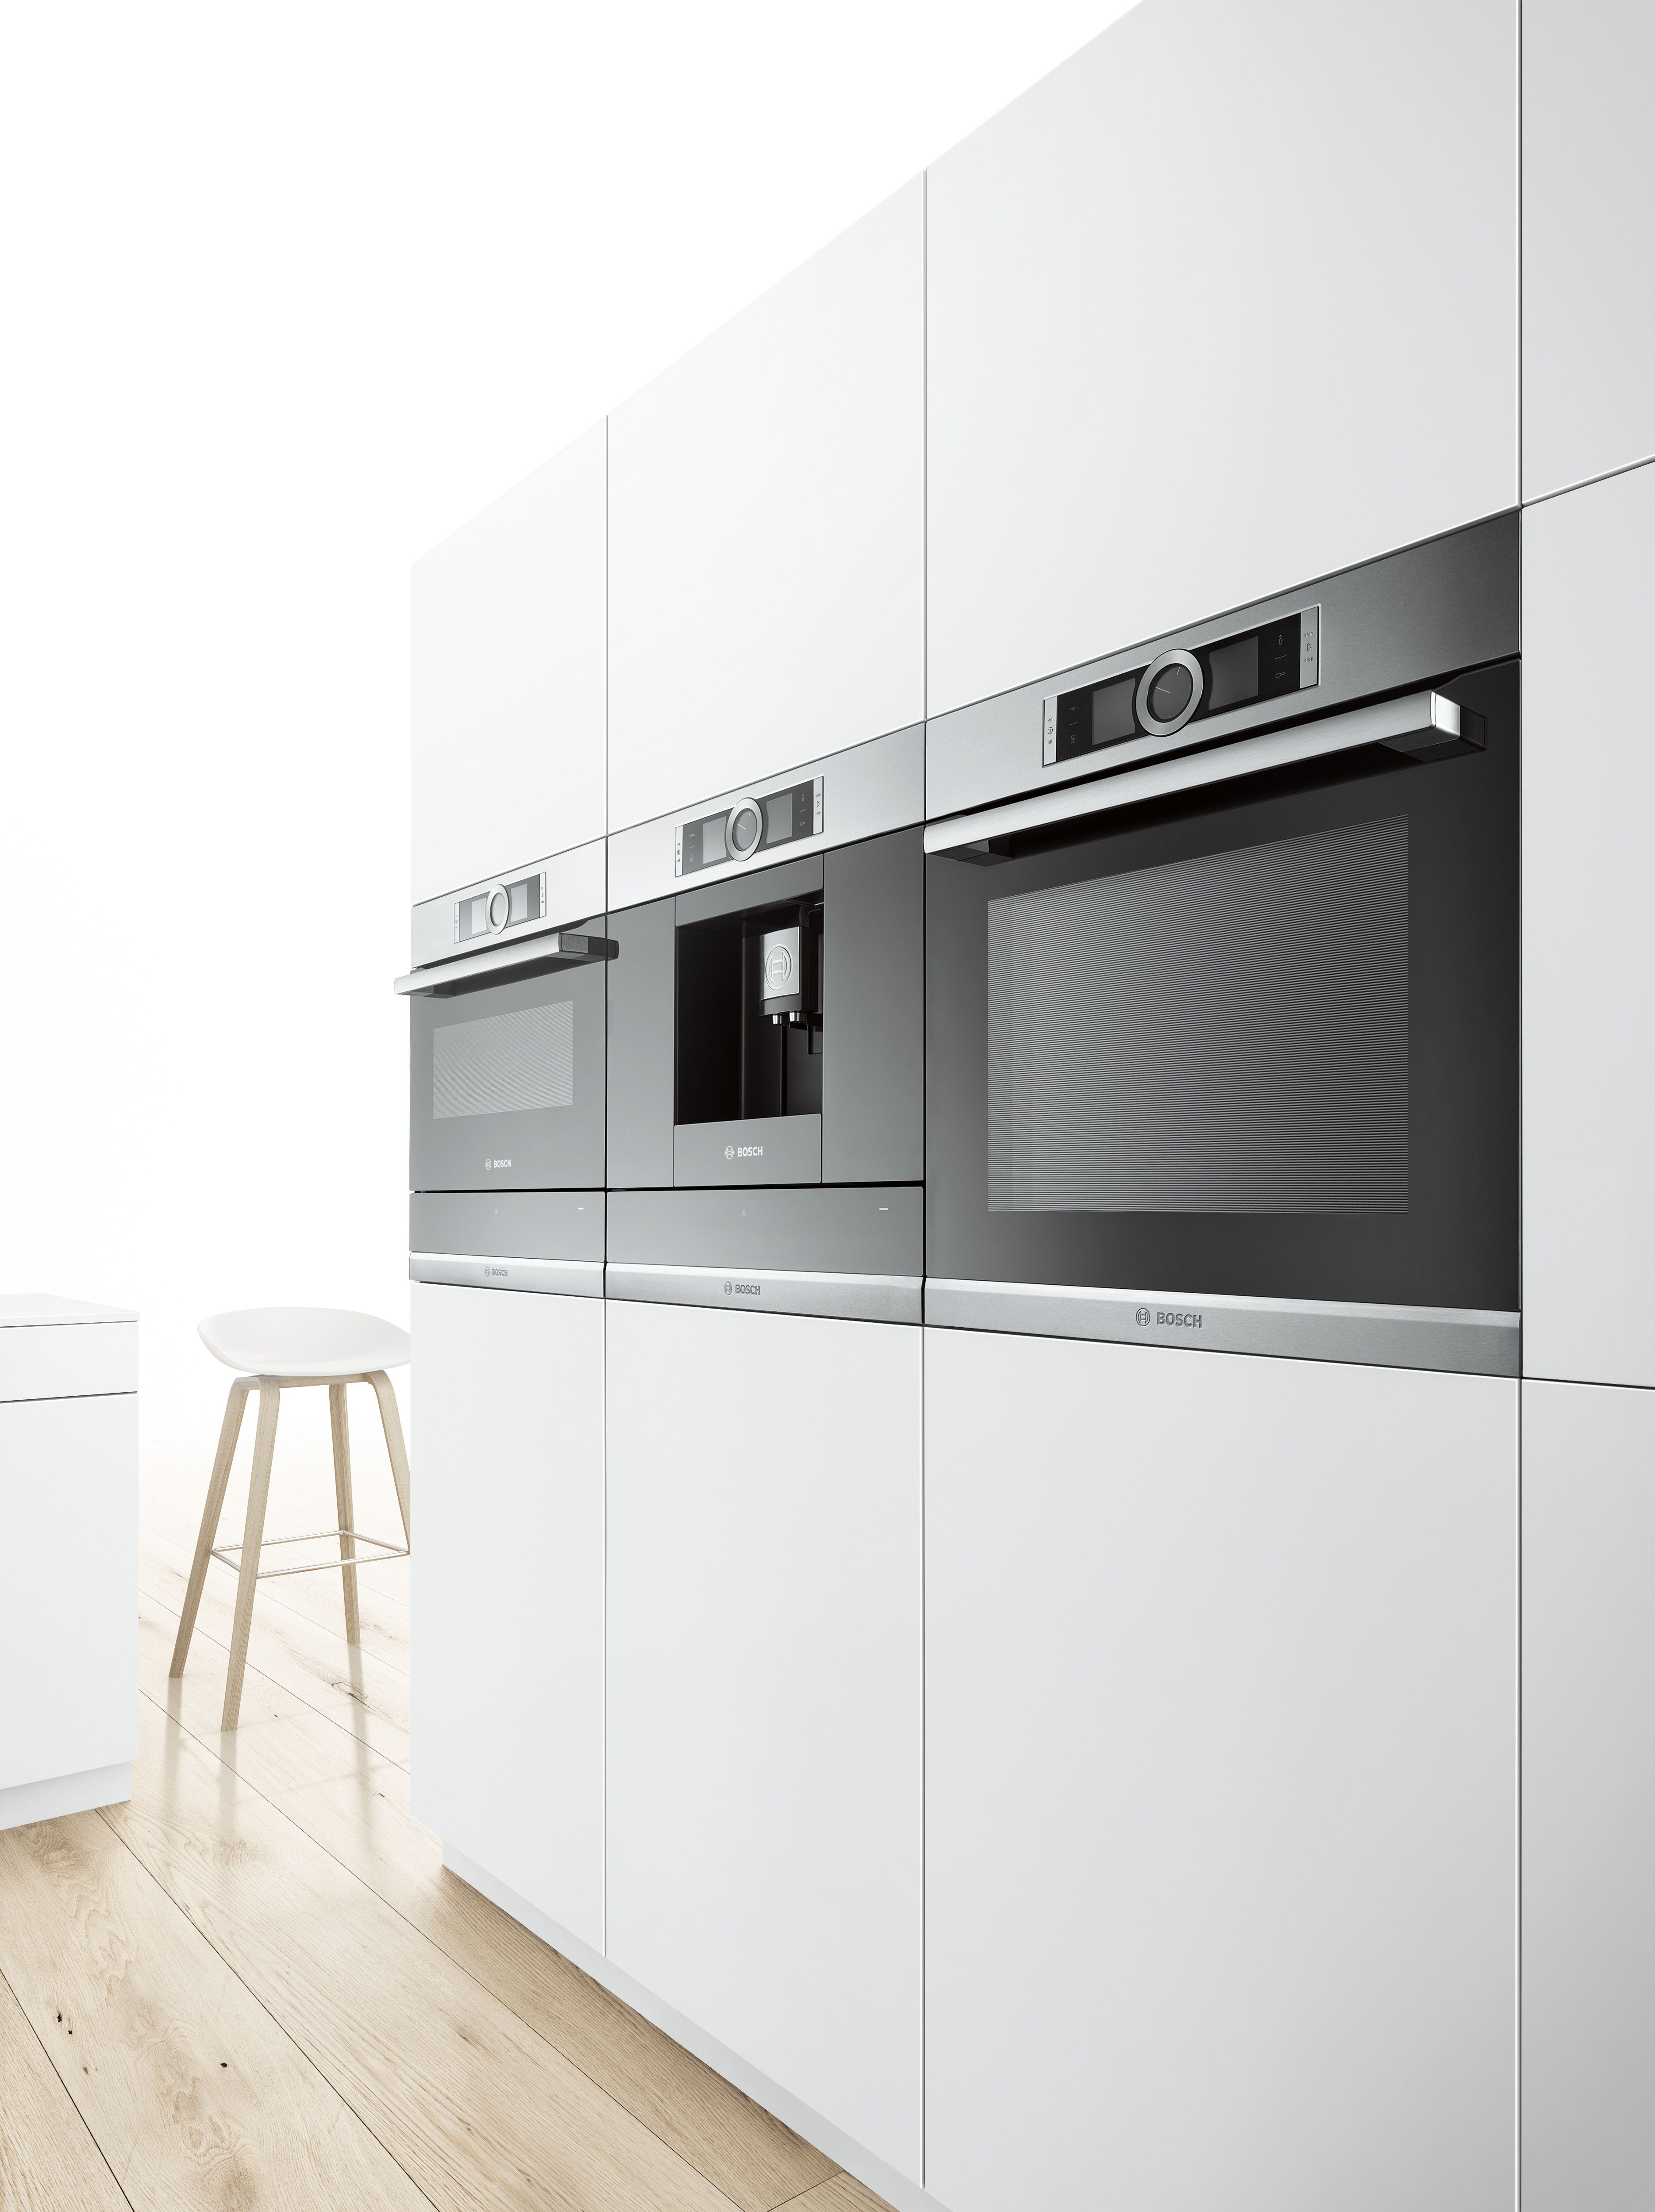 stainless air counter dsc drawer double best dishwasher jenn steel refrigerator single under